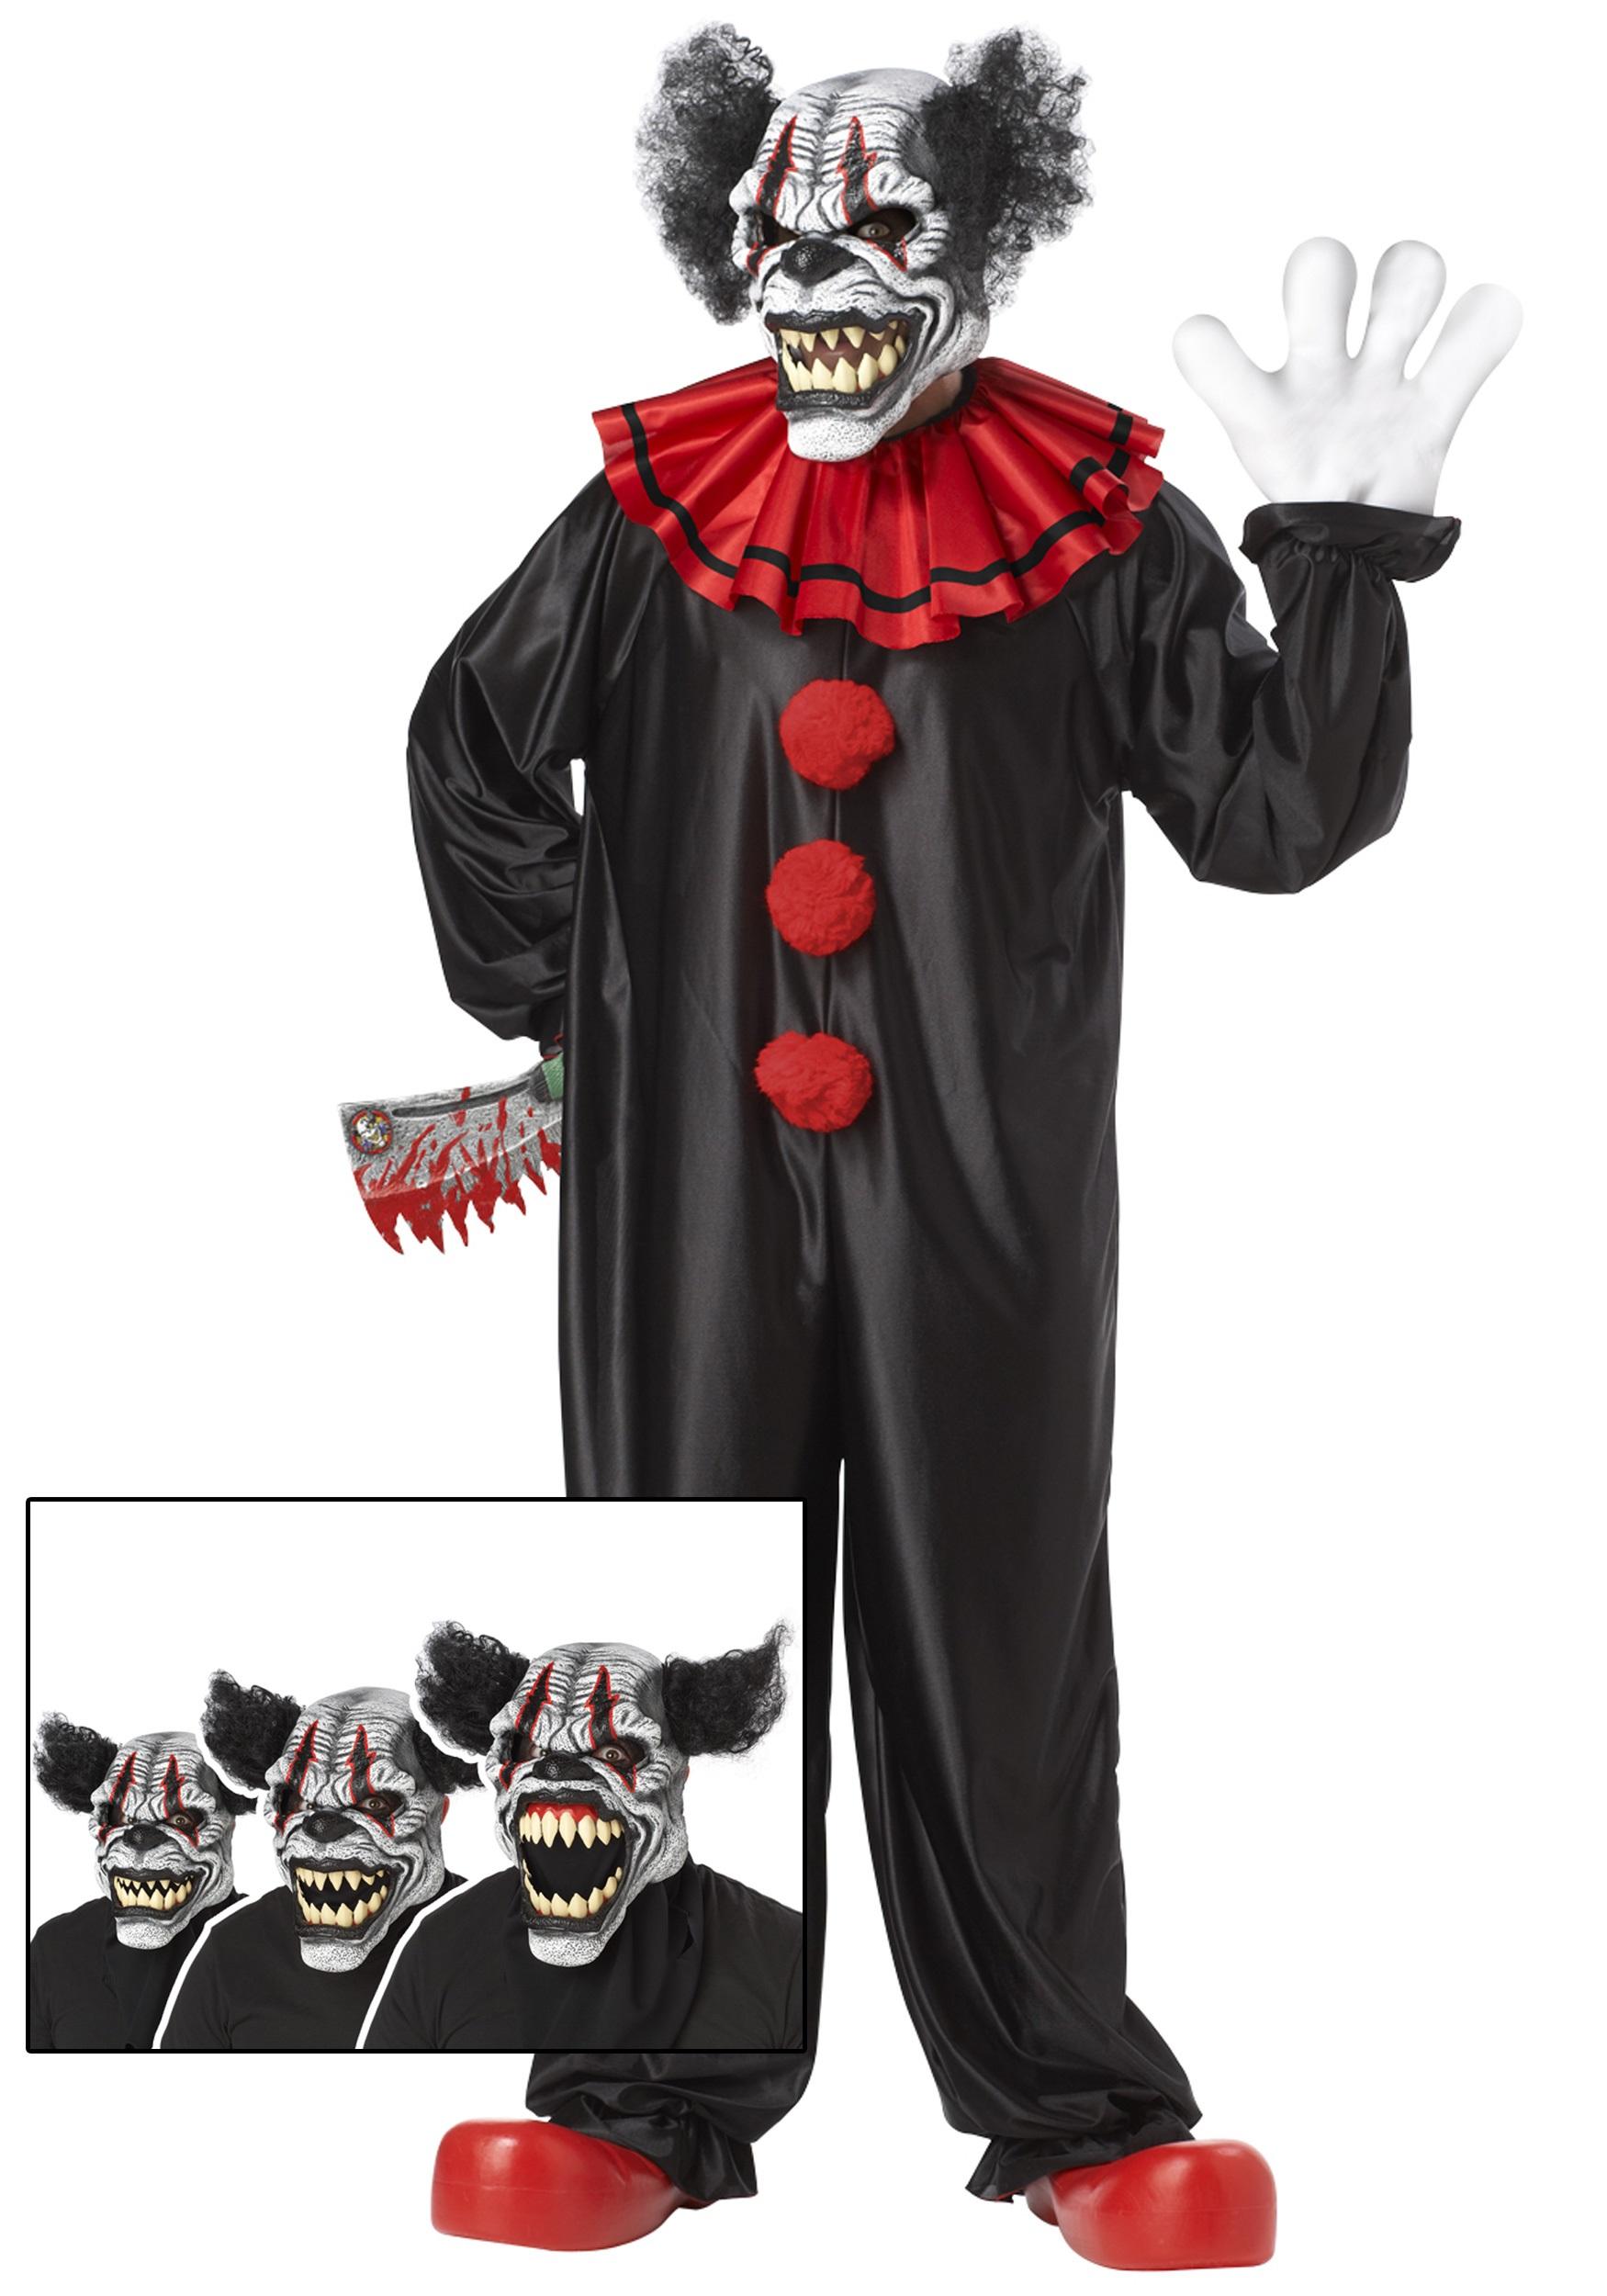 Last Laugh Clown Costume  sc 1 st  Halloween Costumes & Last Laugh Clown Costume - Halloween Costumes